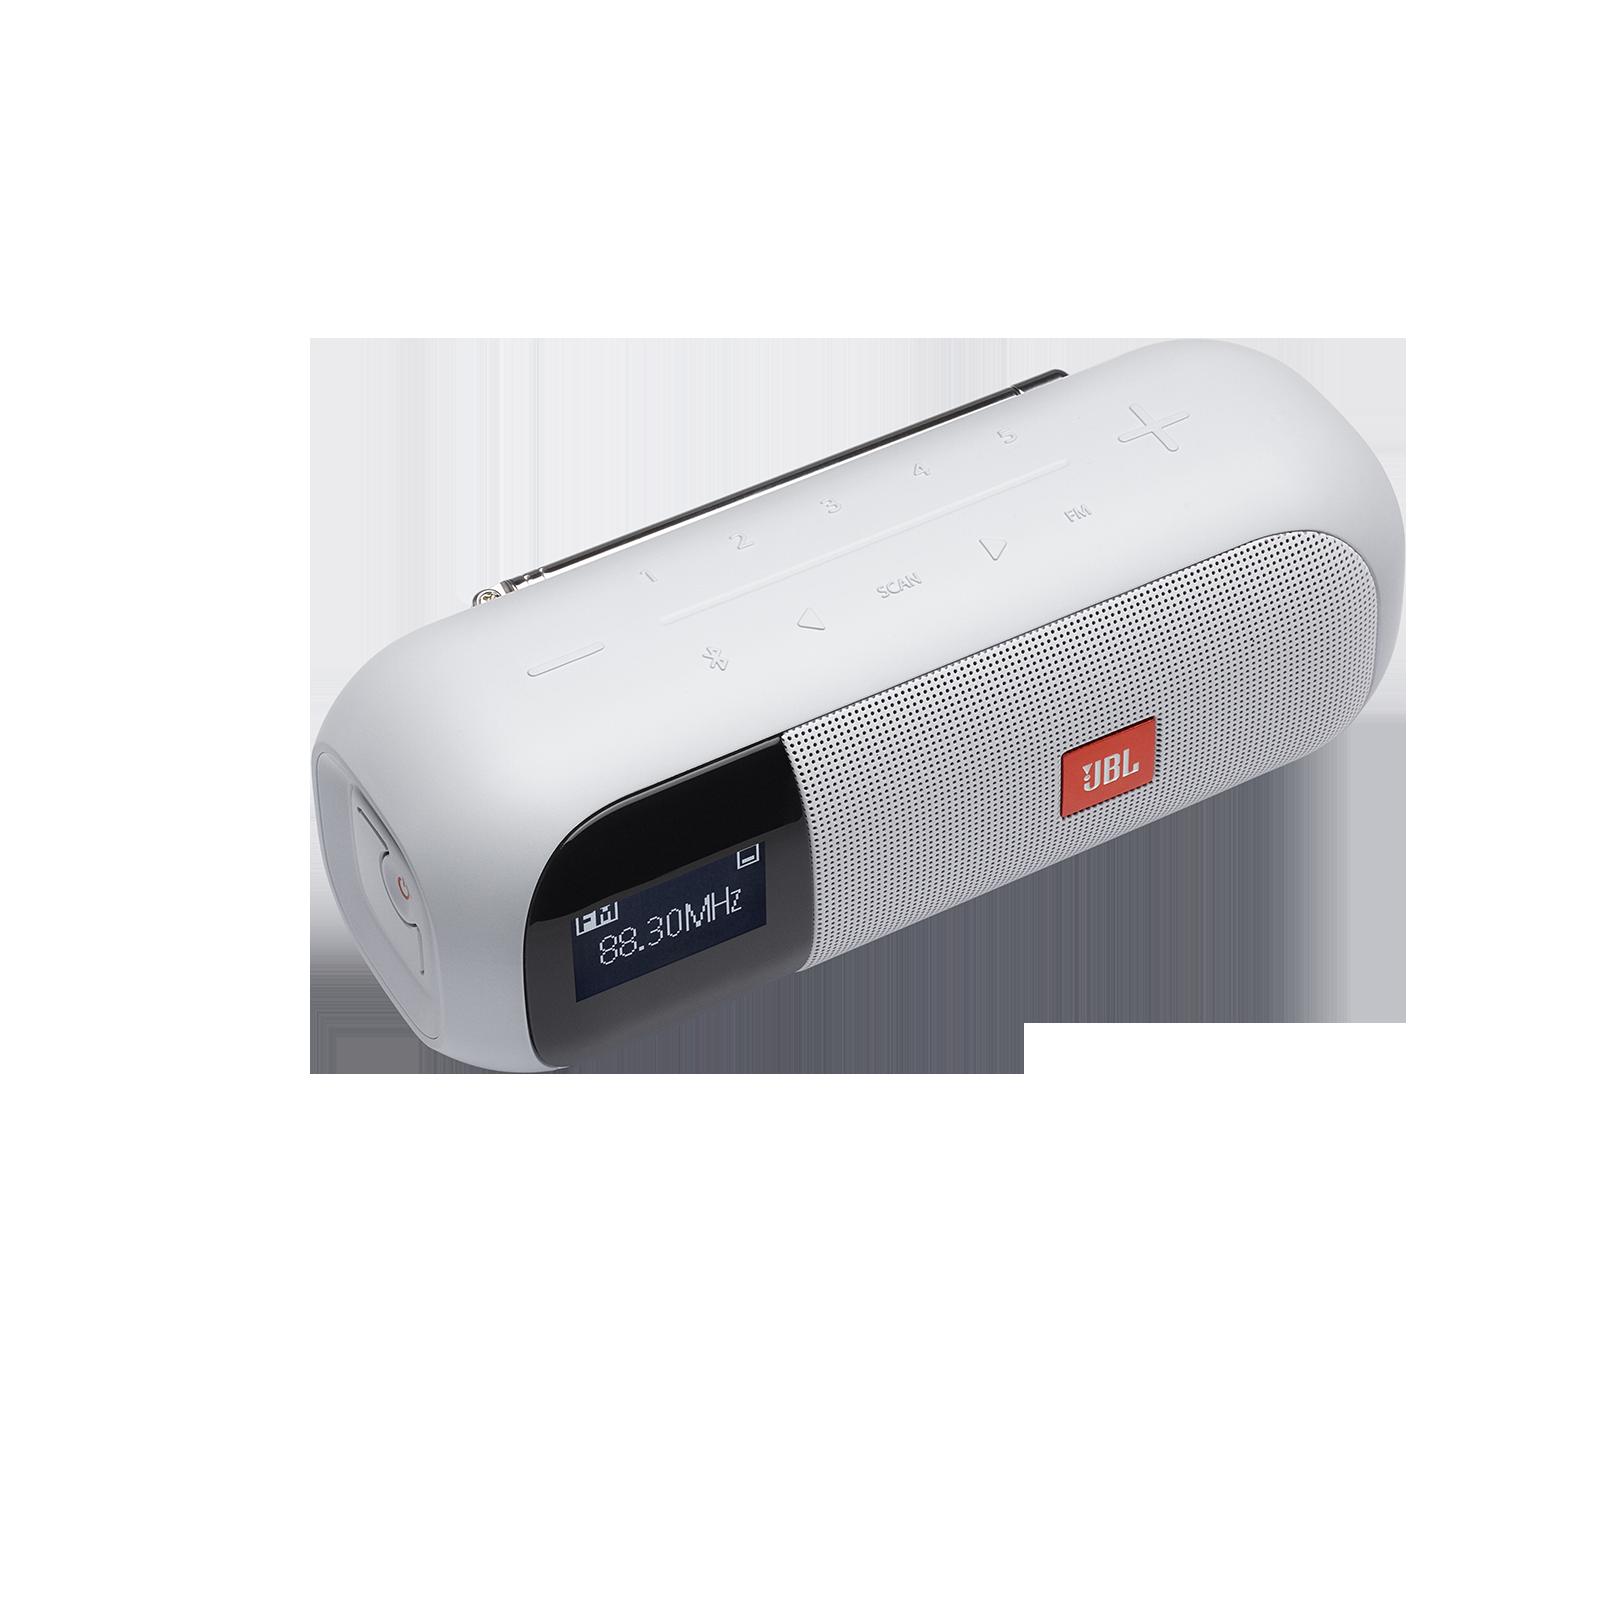 JBL Tuner 2 FM - White - Portable FM radio with Bluetooth - Detailshot 3